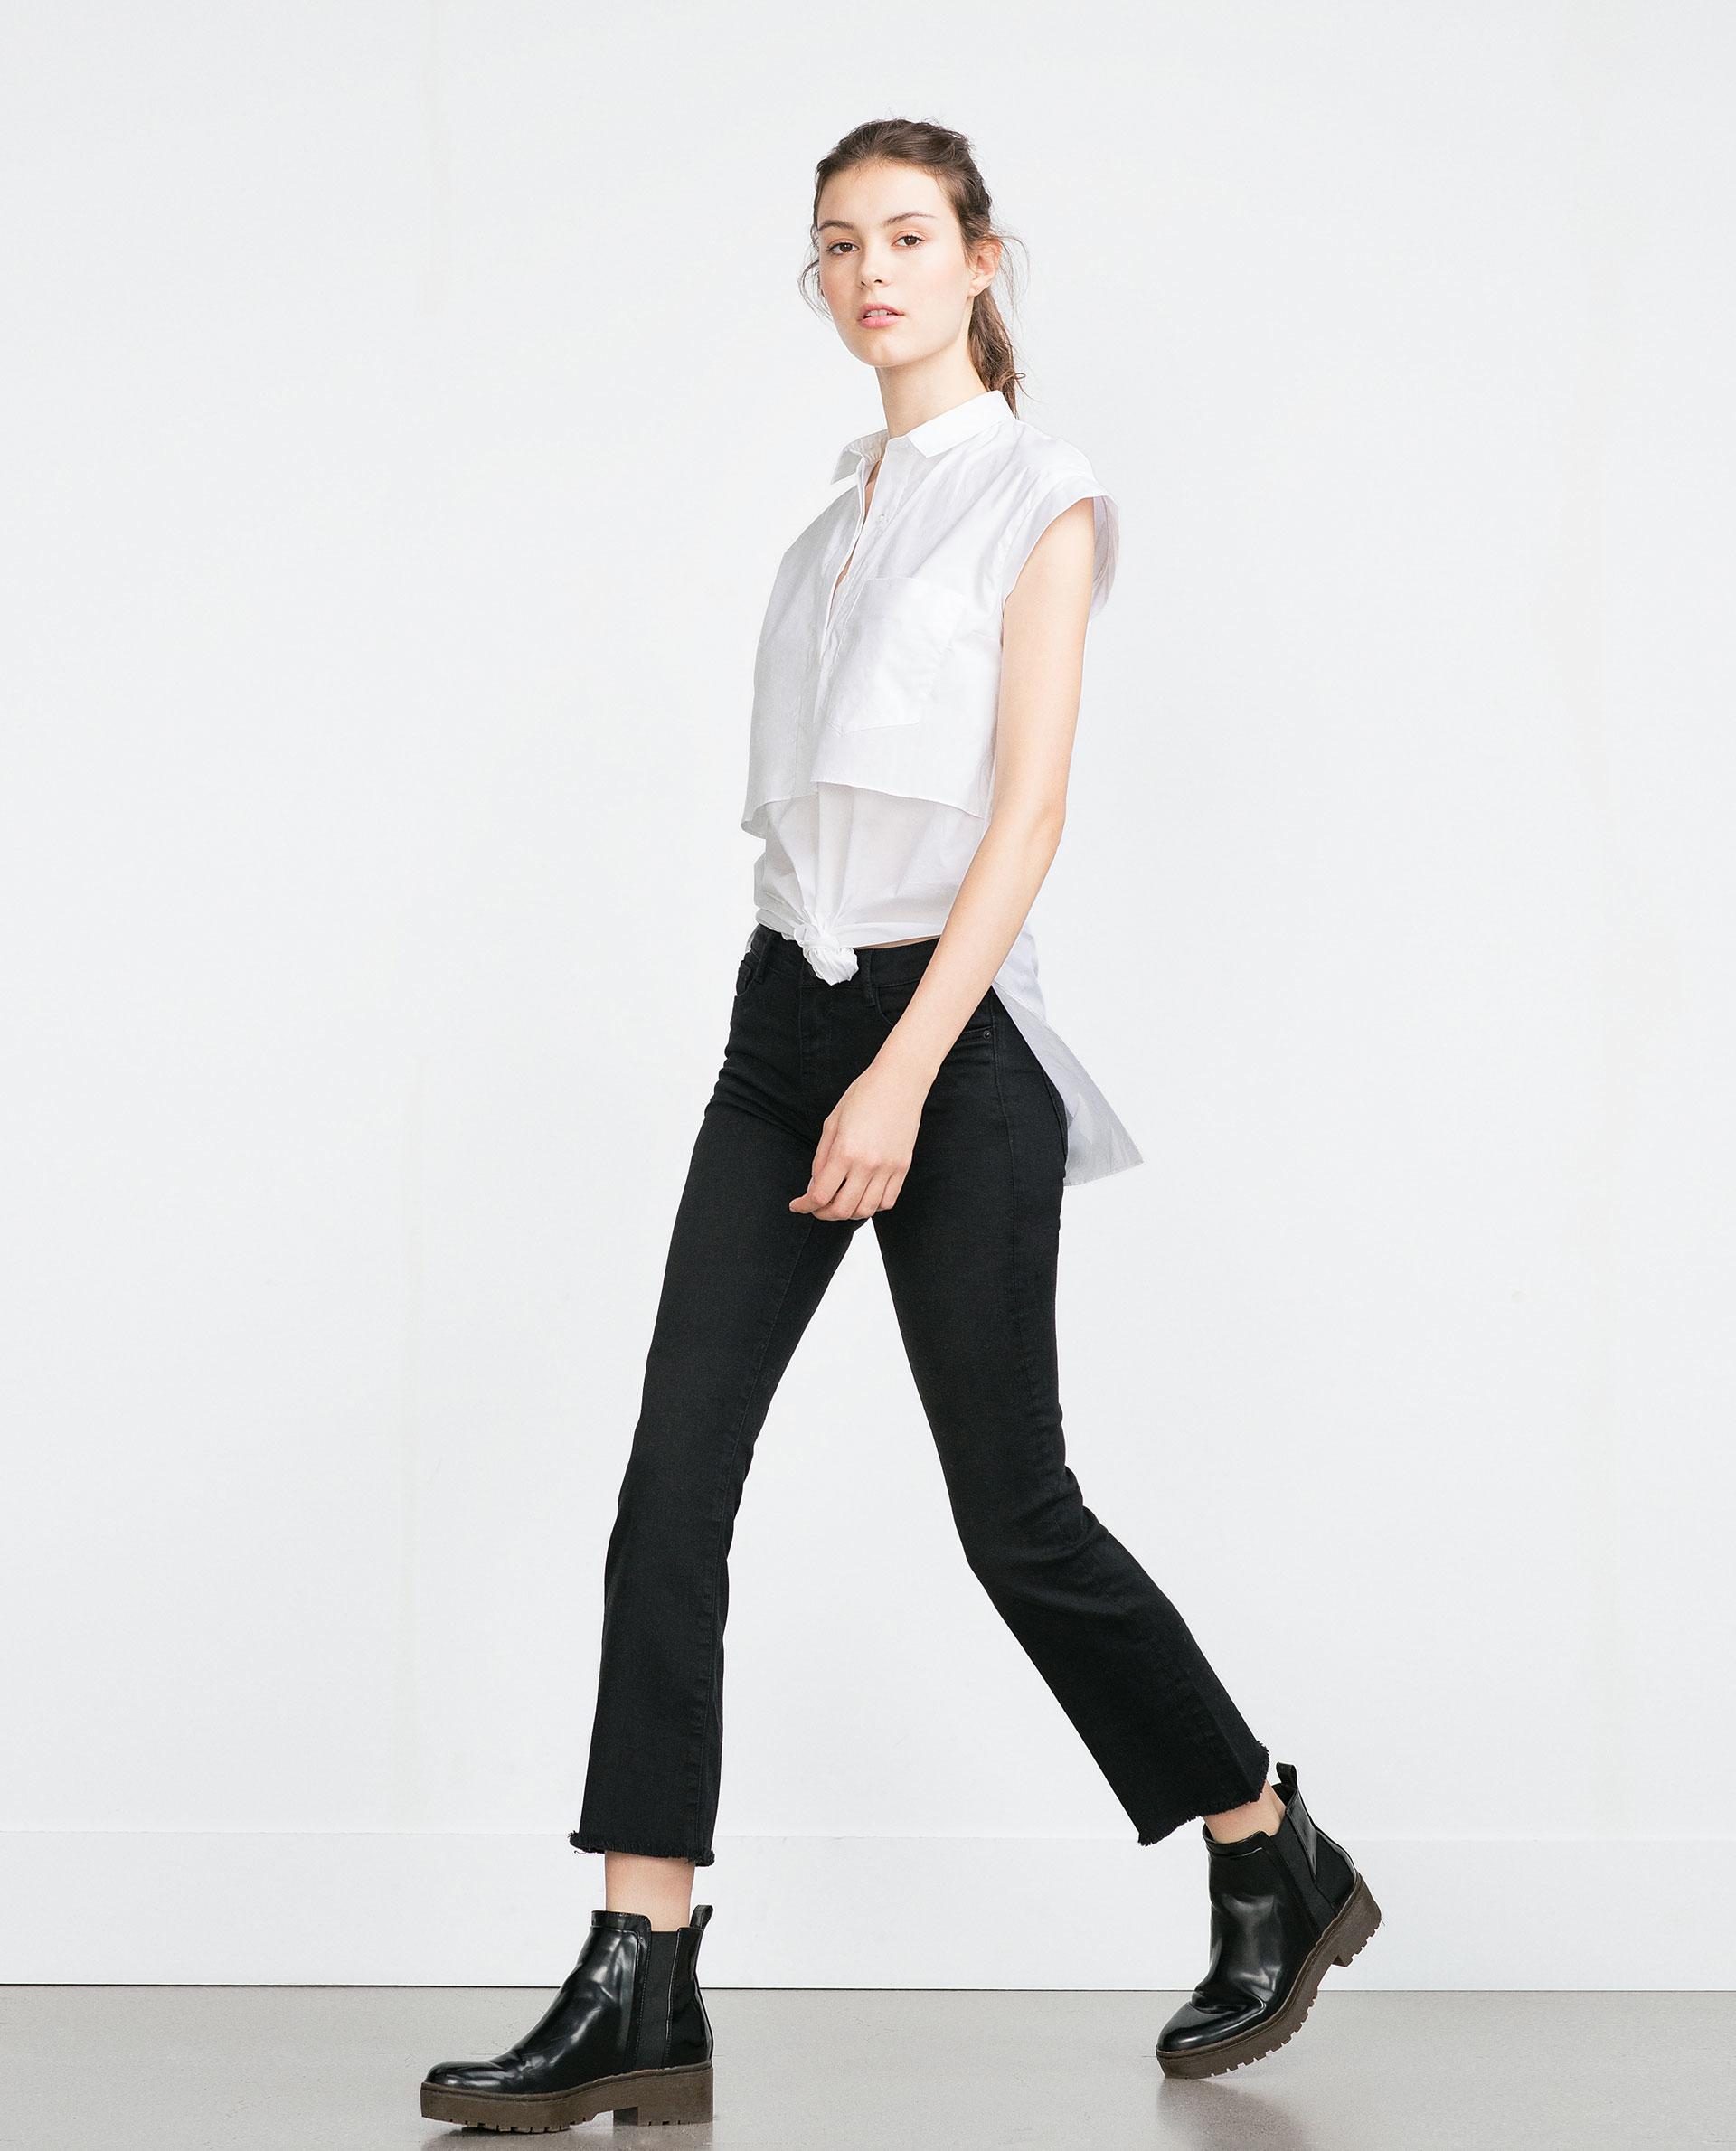 Zara Cropped Flared Jeans in Black | Lyst